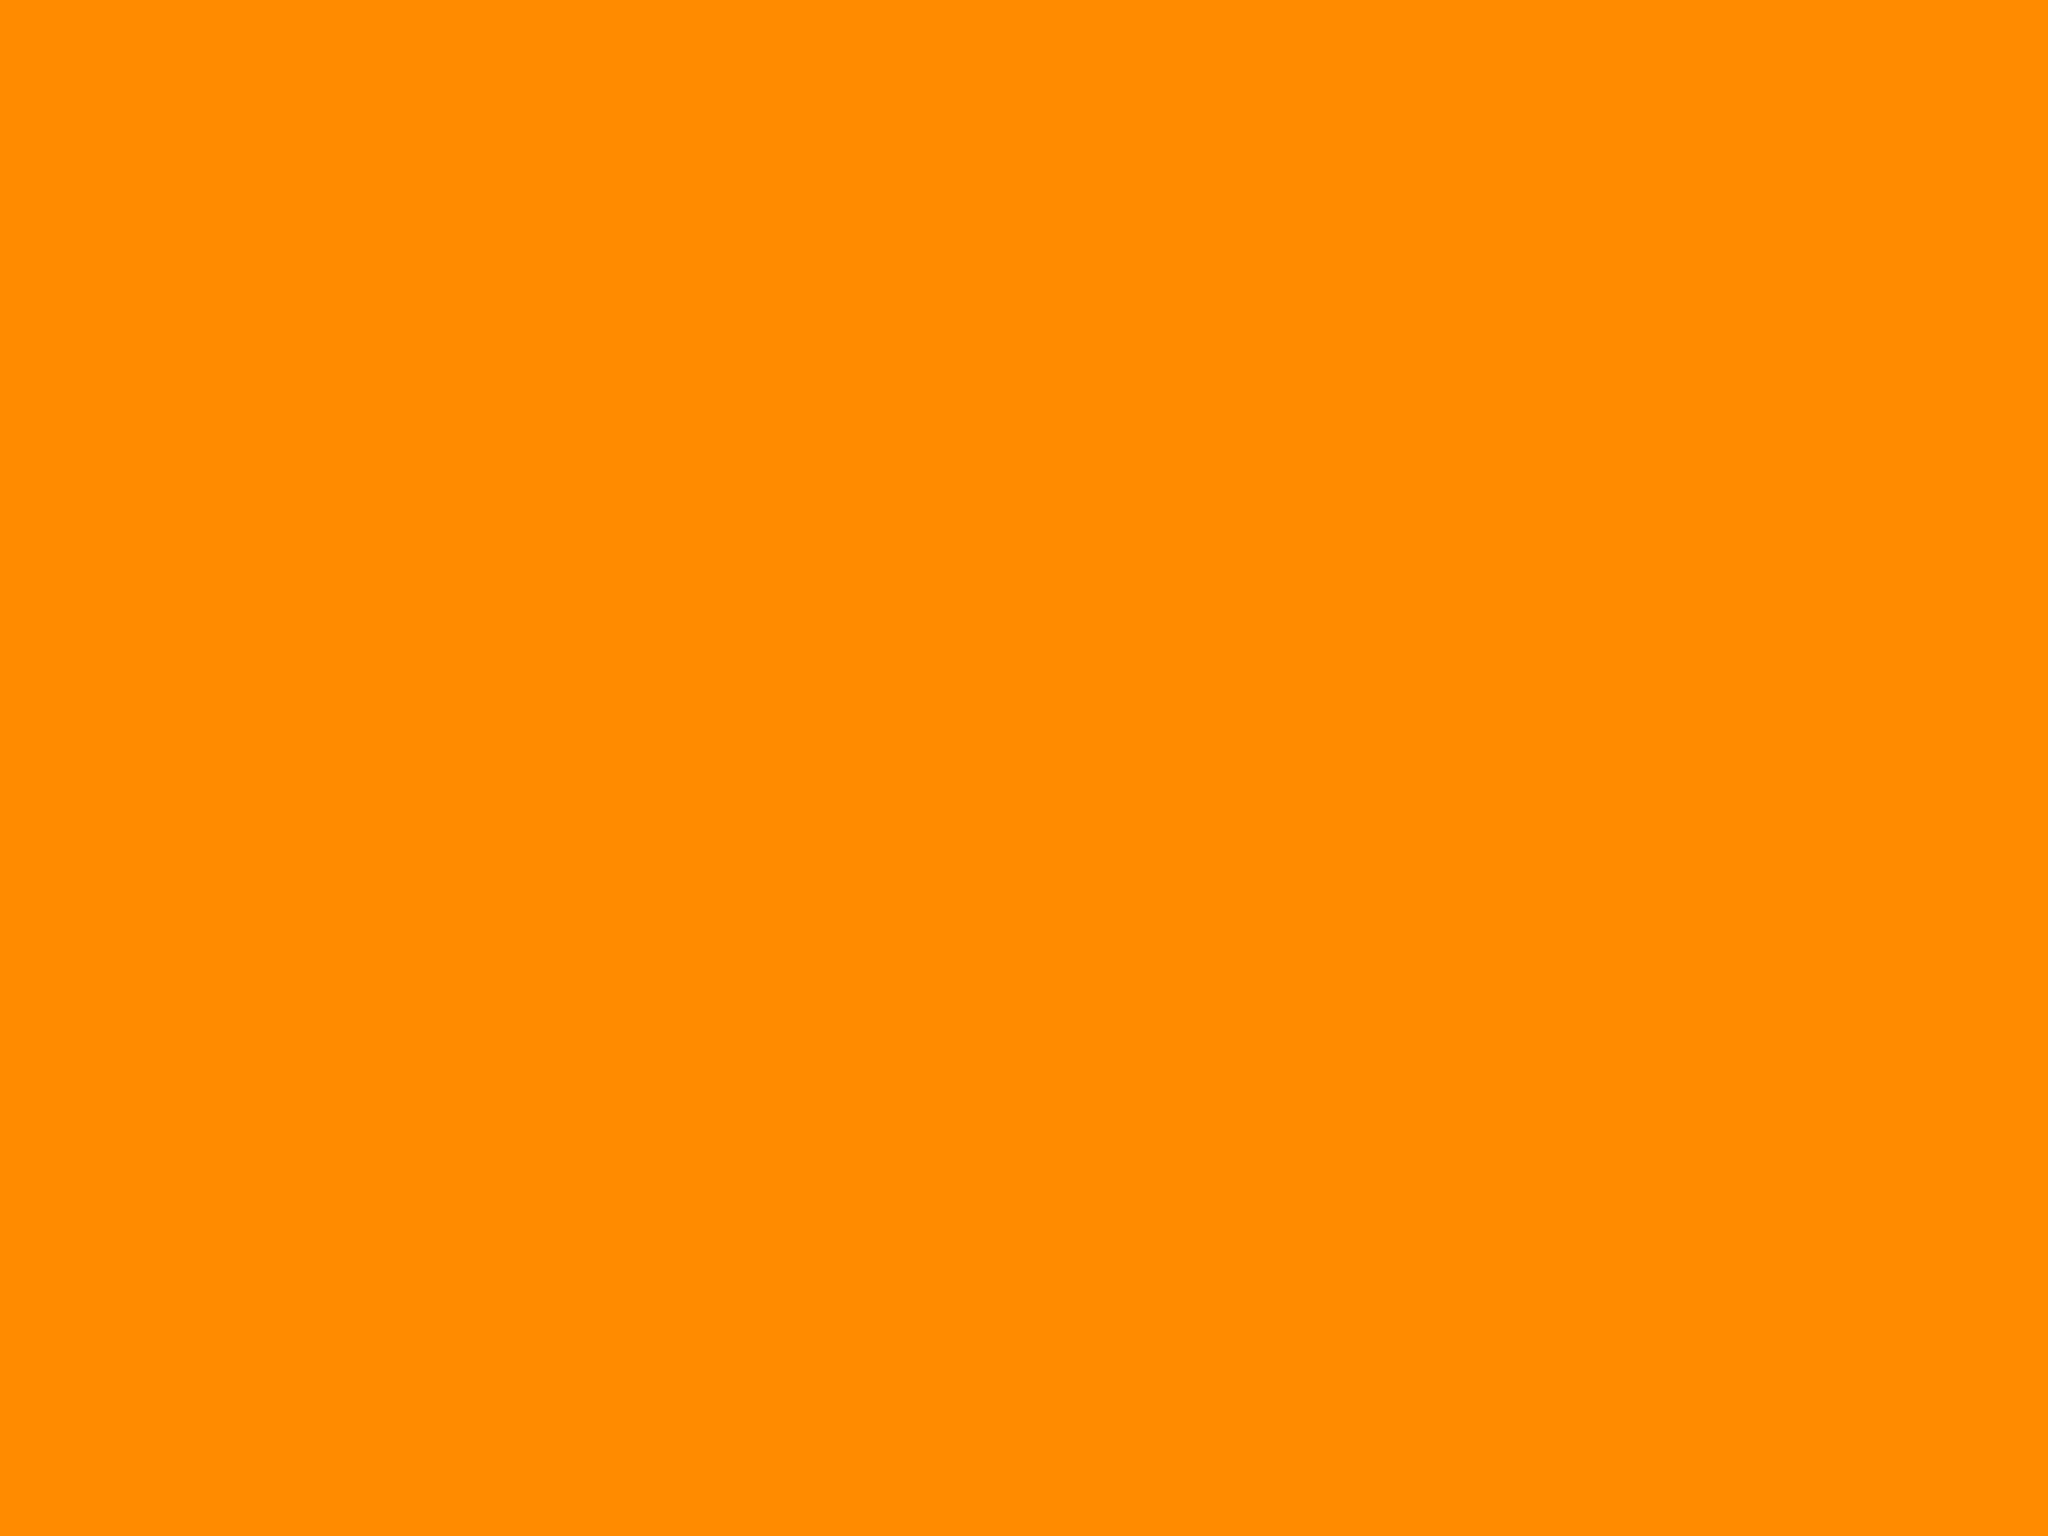 2048x1536 Dark Orange Solid Color Background